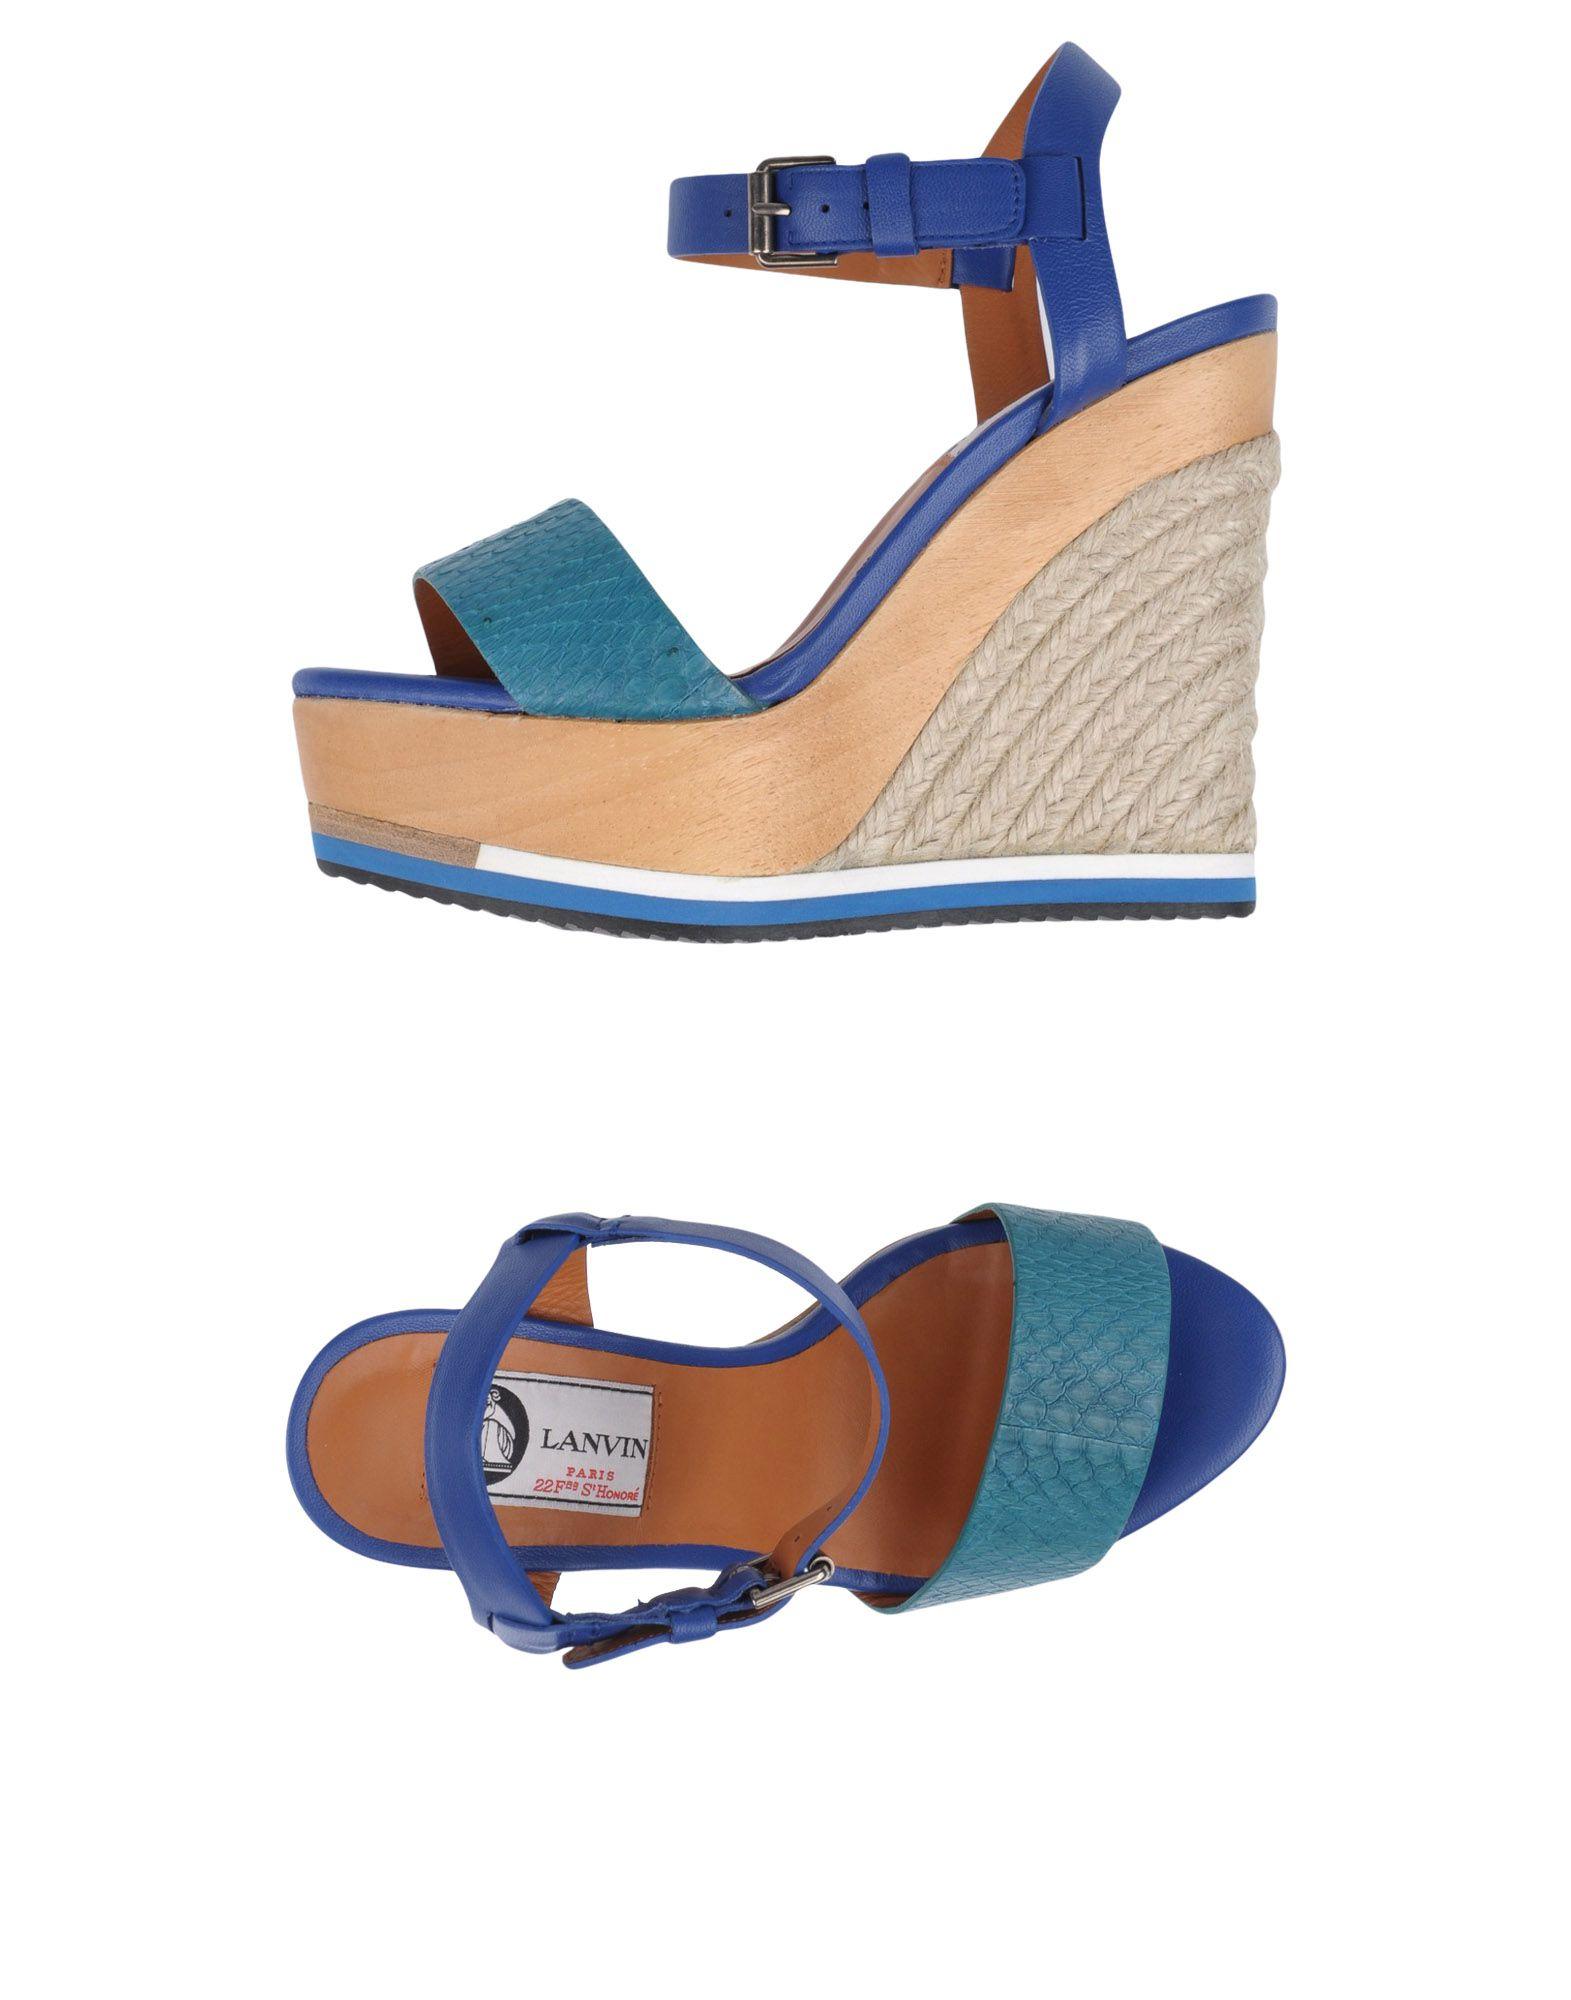 Moda Espadrillas Lanvin Donna - 11099142ST 11099142ST - 717366